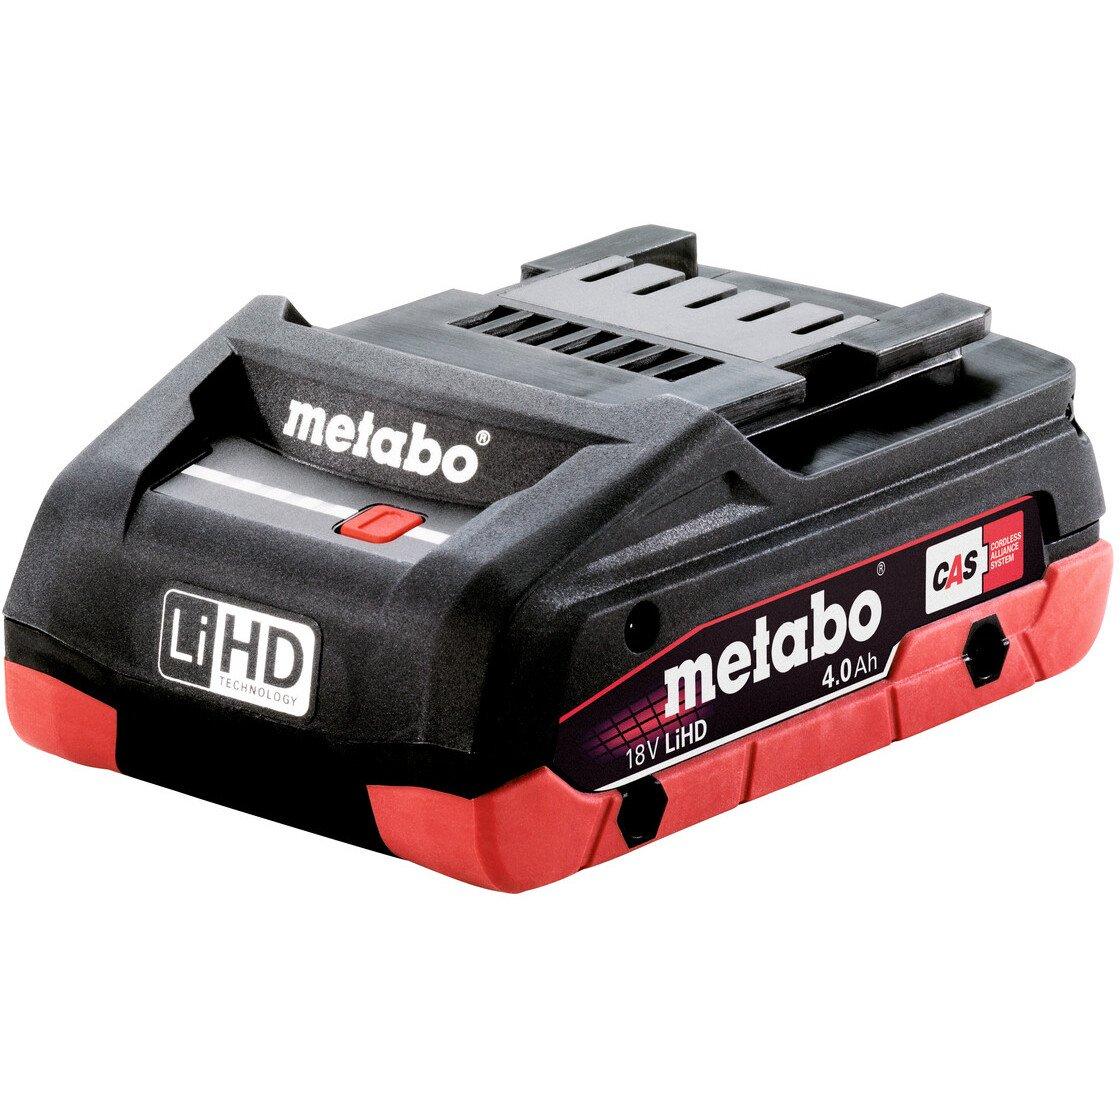 Metabo 625367000 18v 4.0Ah LiHD Battery